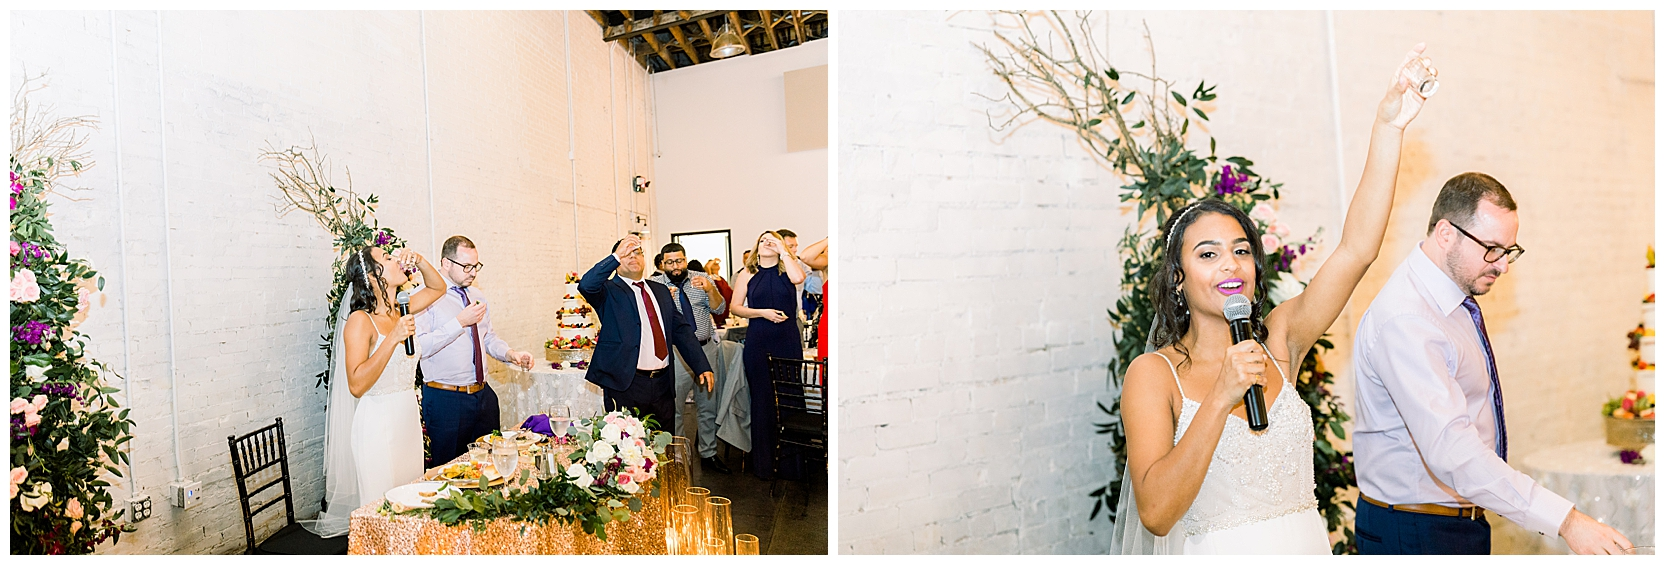 jessicafredericks_lakeland_tampa_wedding_purple_crazy hour_0081.jpg